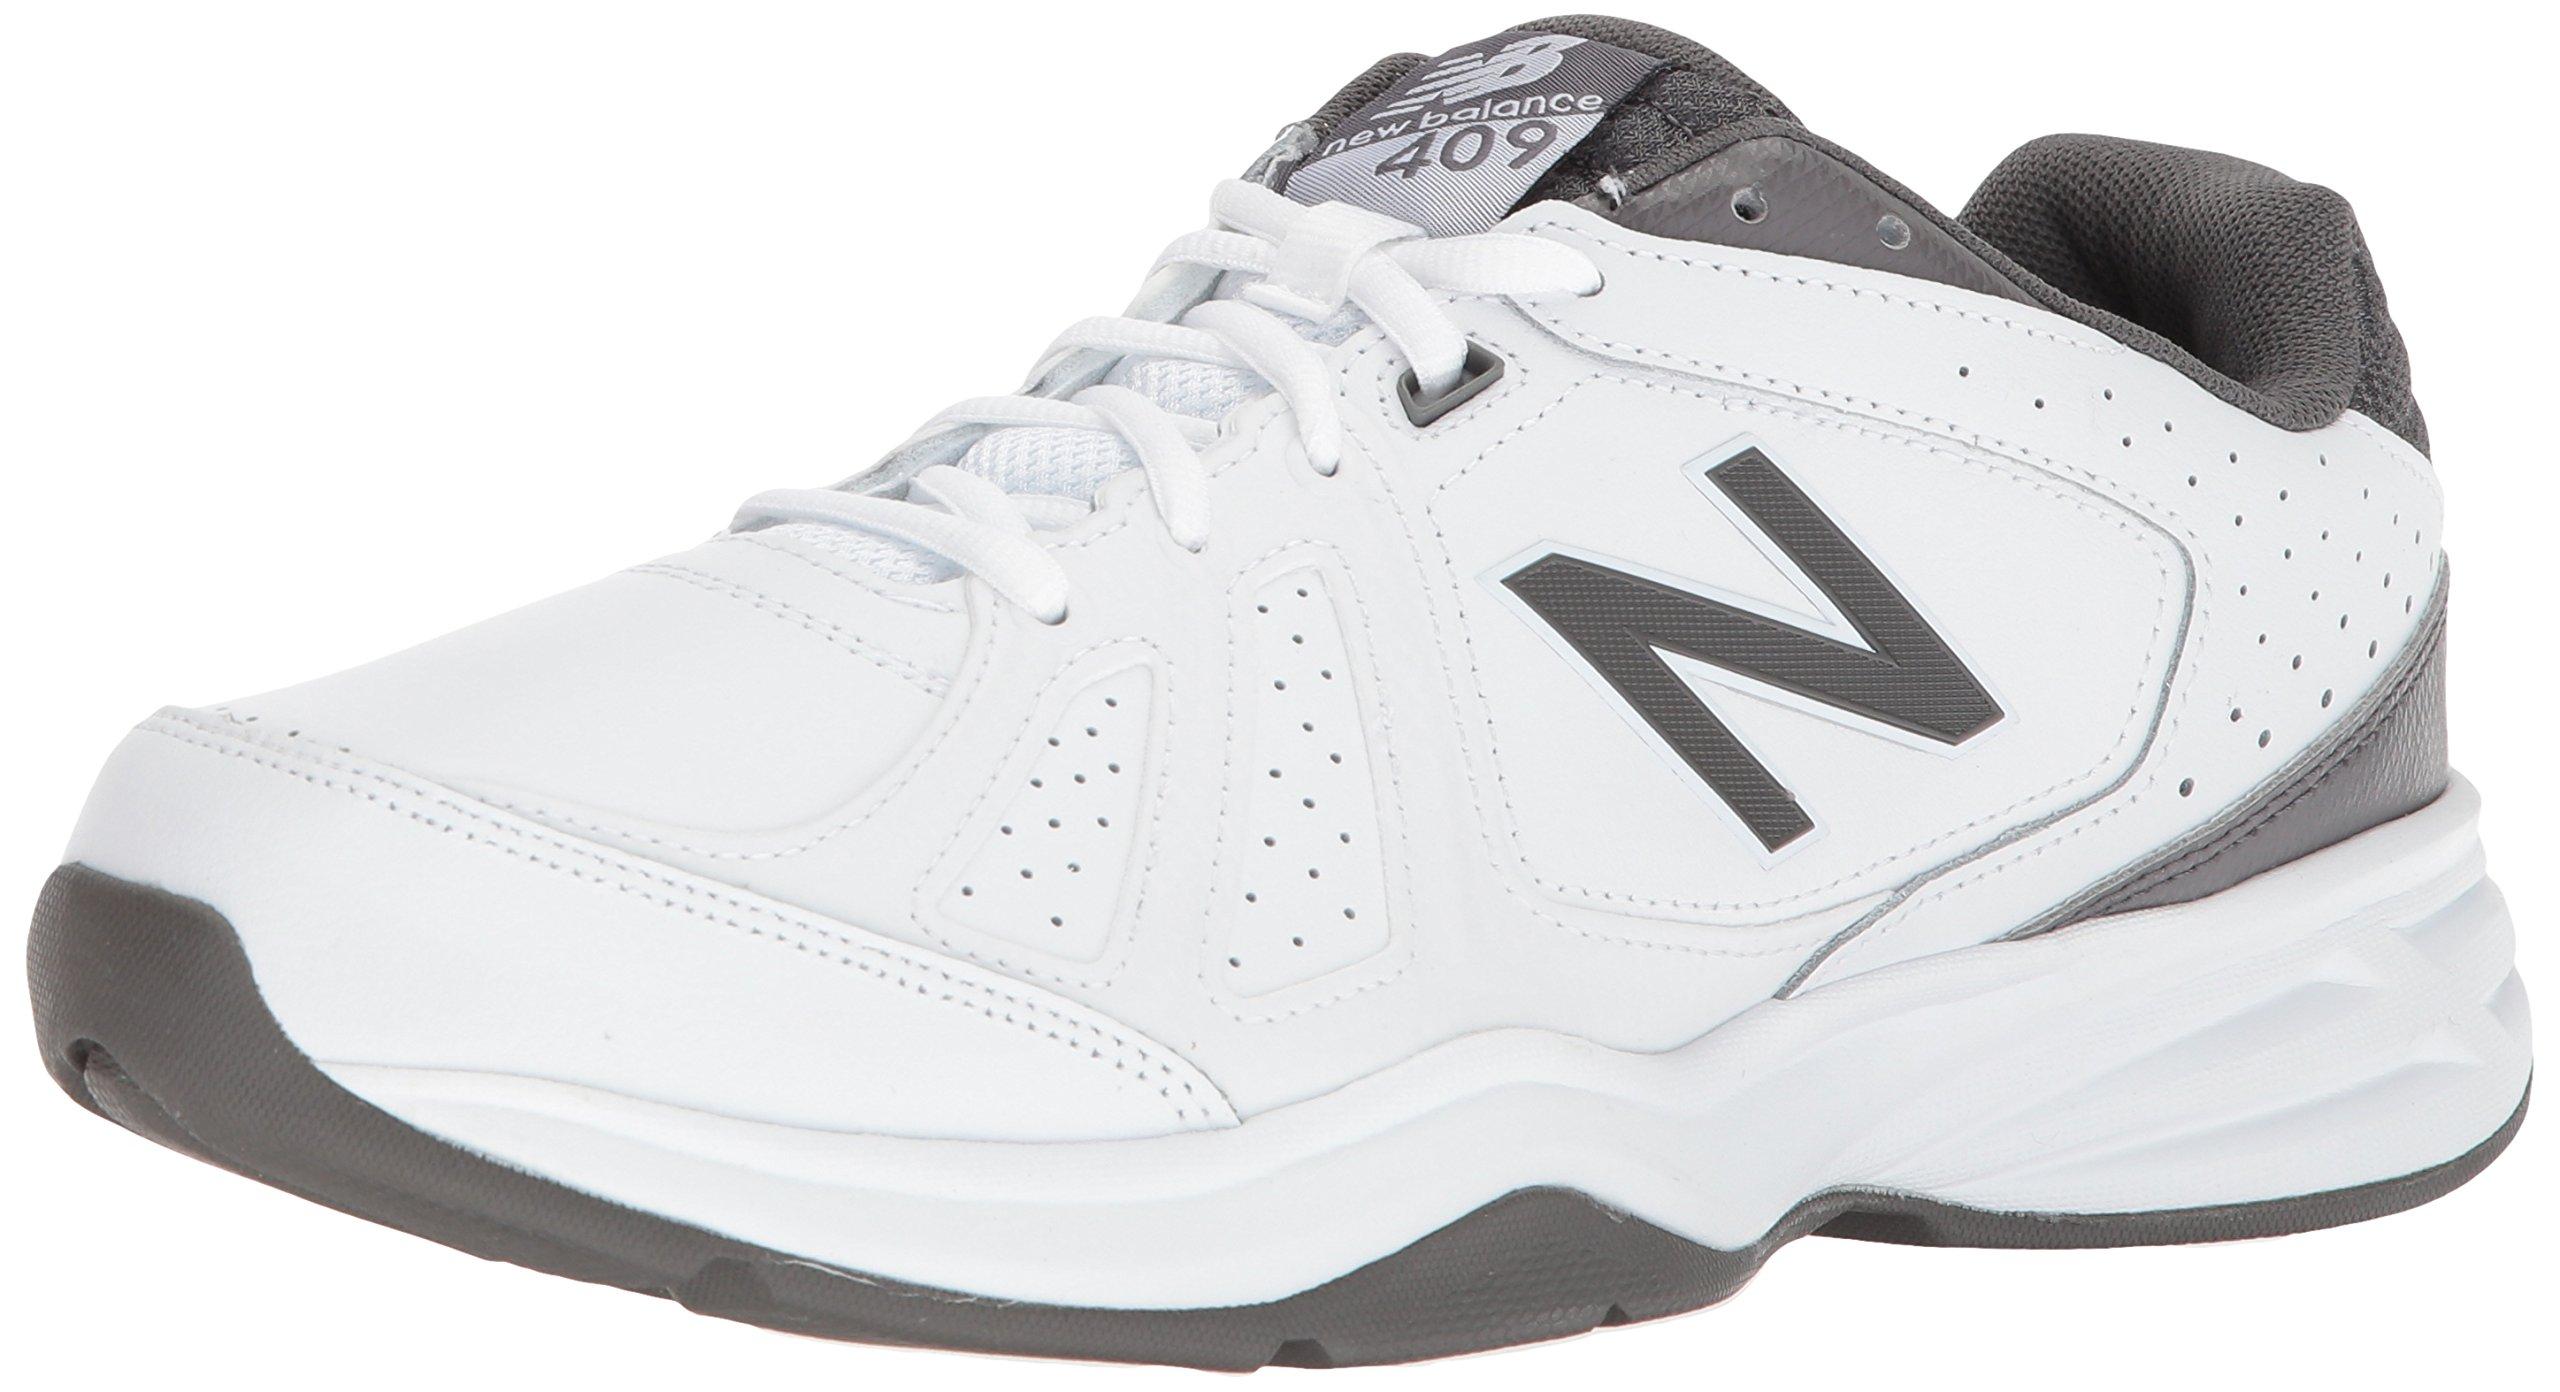 New Balance Men's mx409v3 Casual Comfort Training Shoe, White/Grey, 12 M US by New Balance